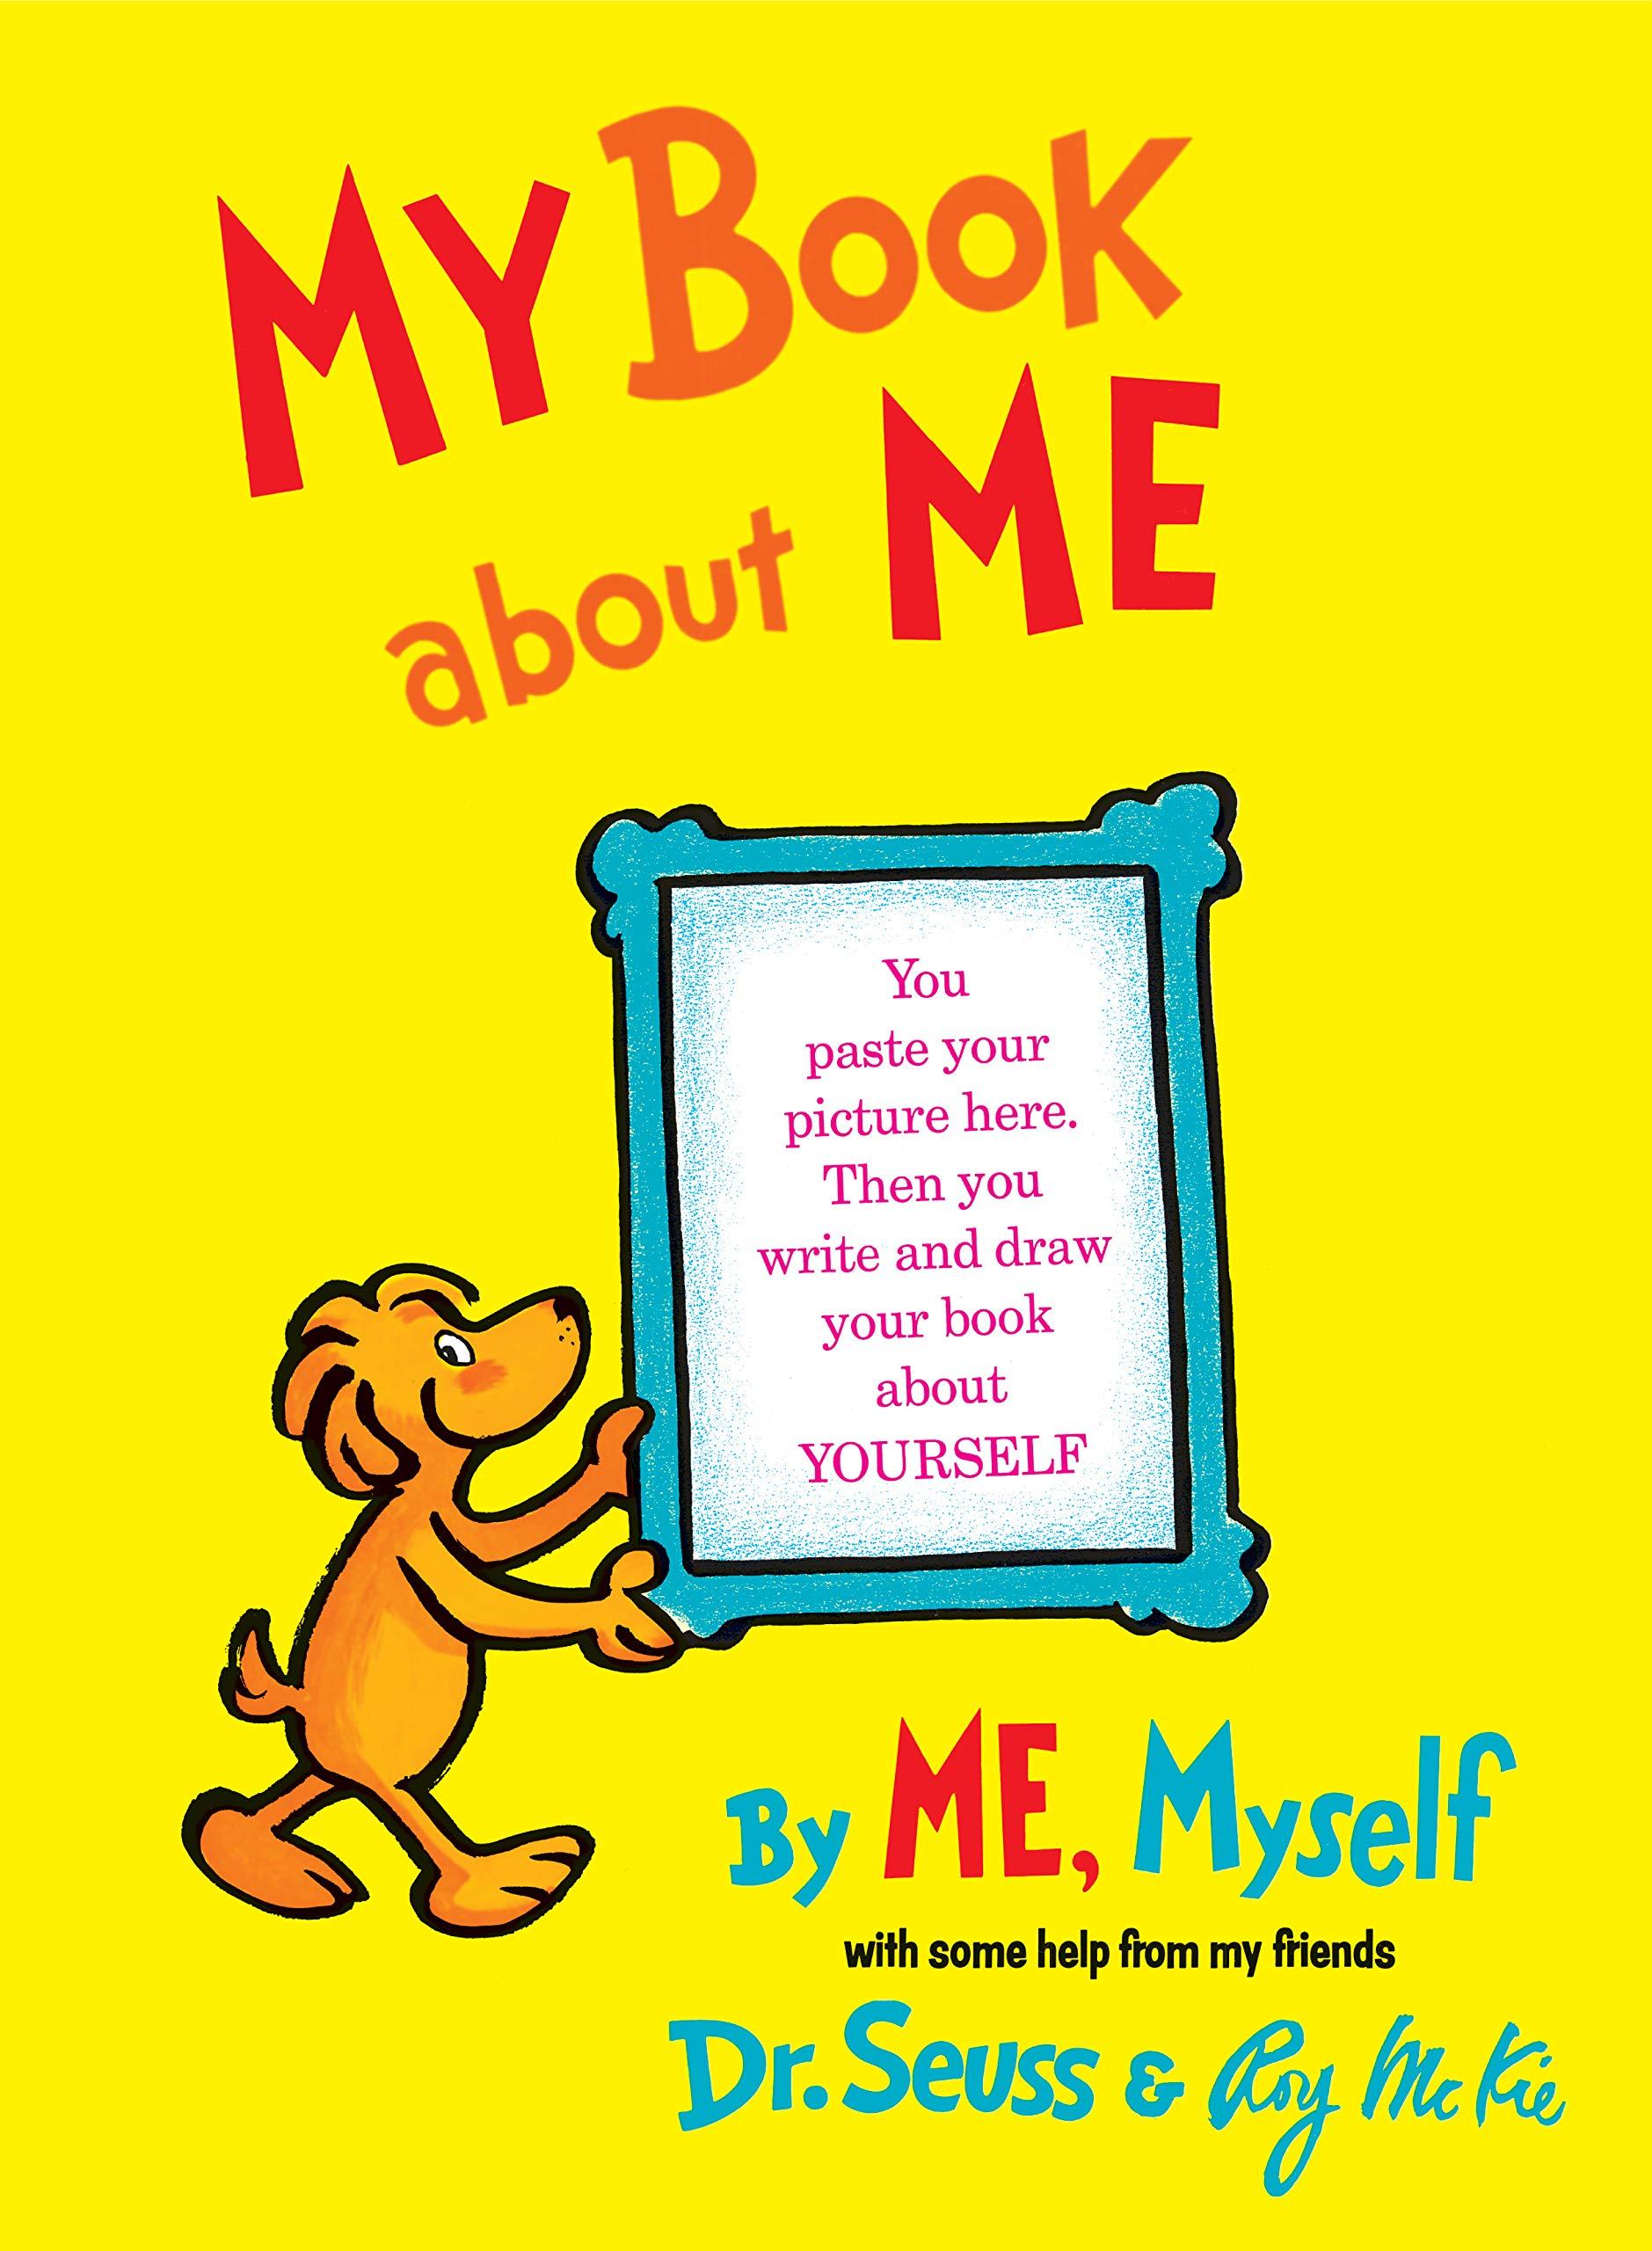 My Book About Me Dr Seuss Roy Mckie 0038332269970 Amazon Com Books